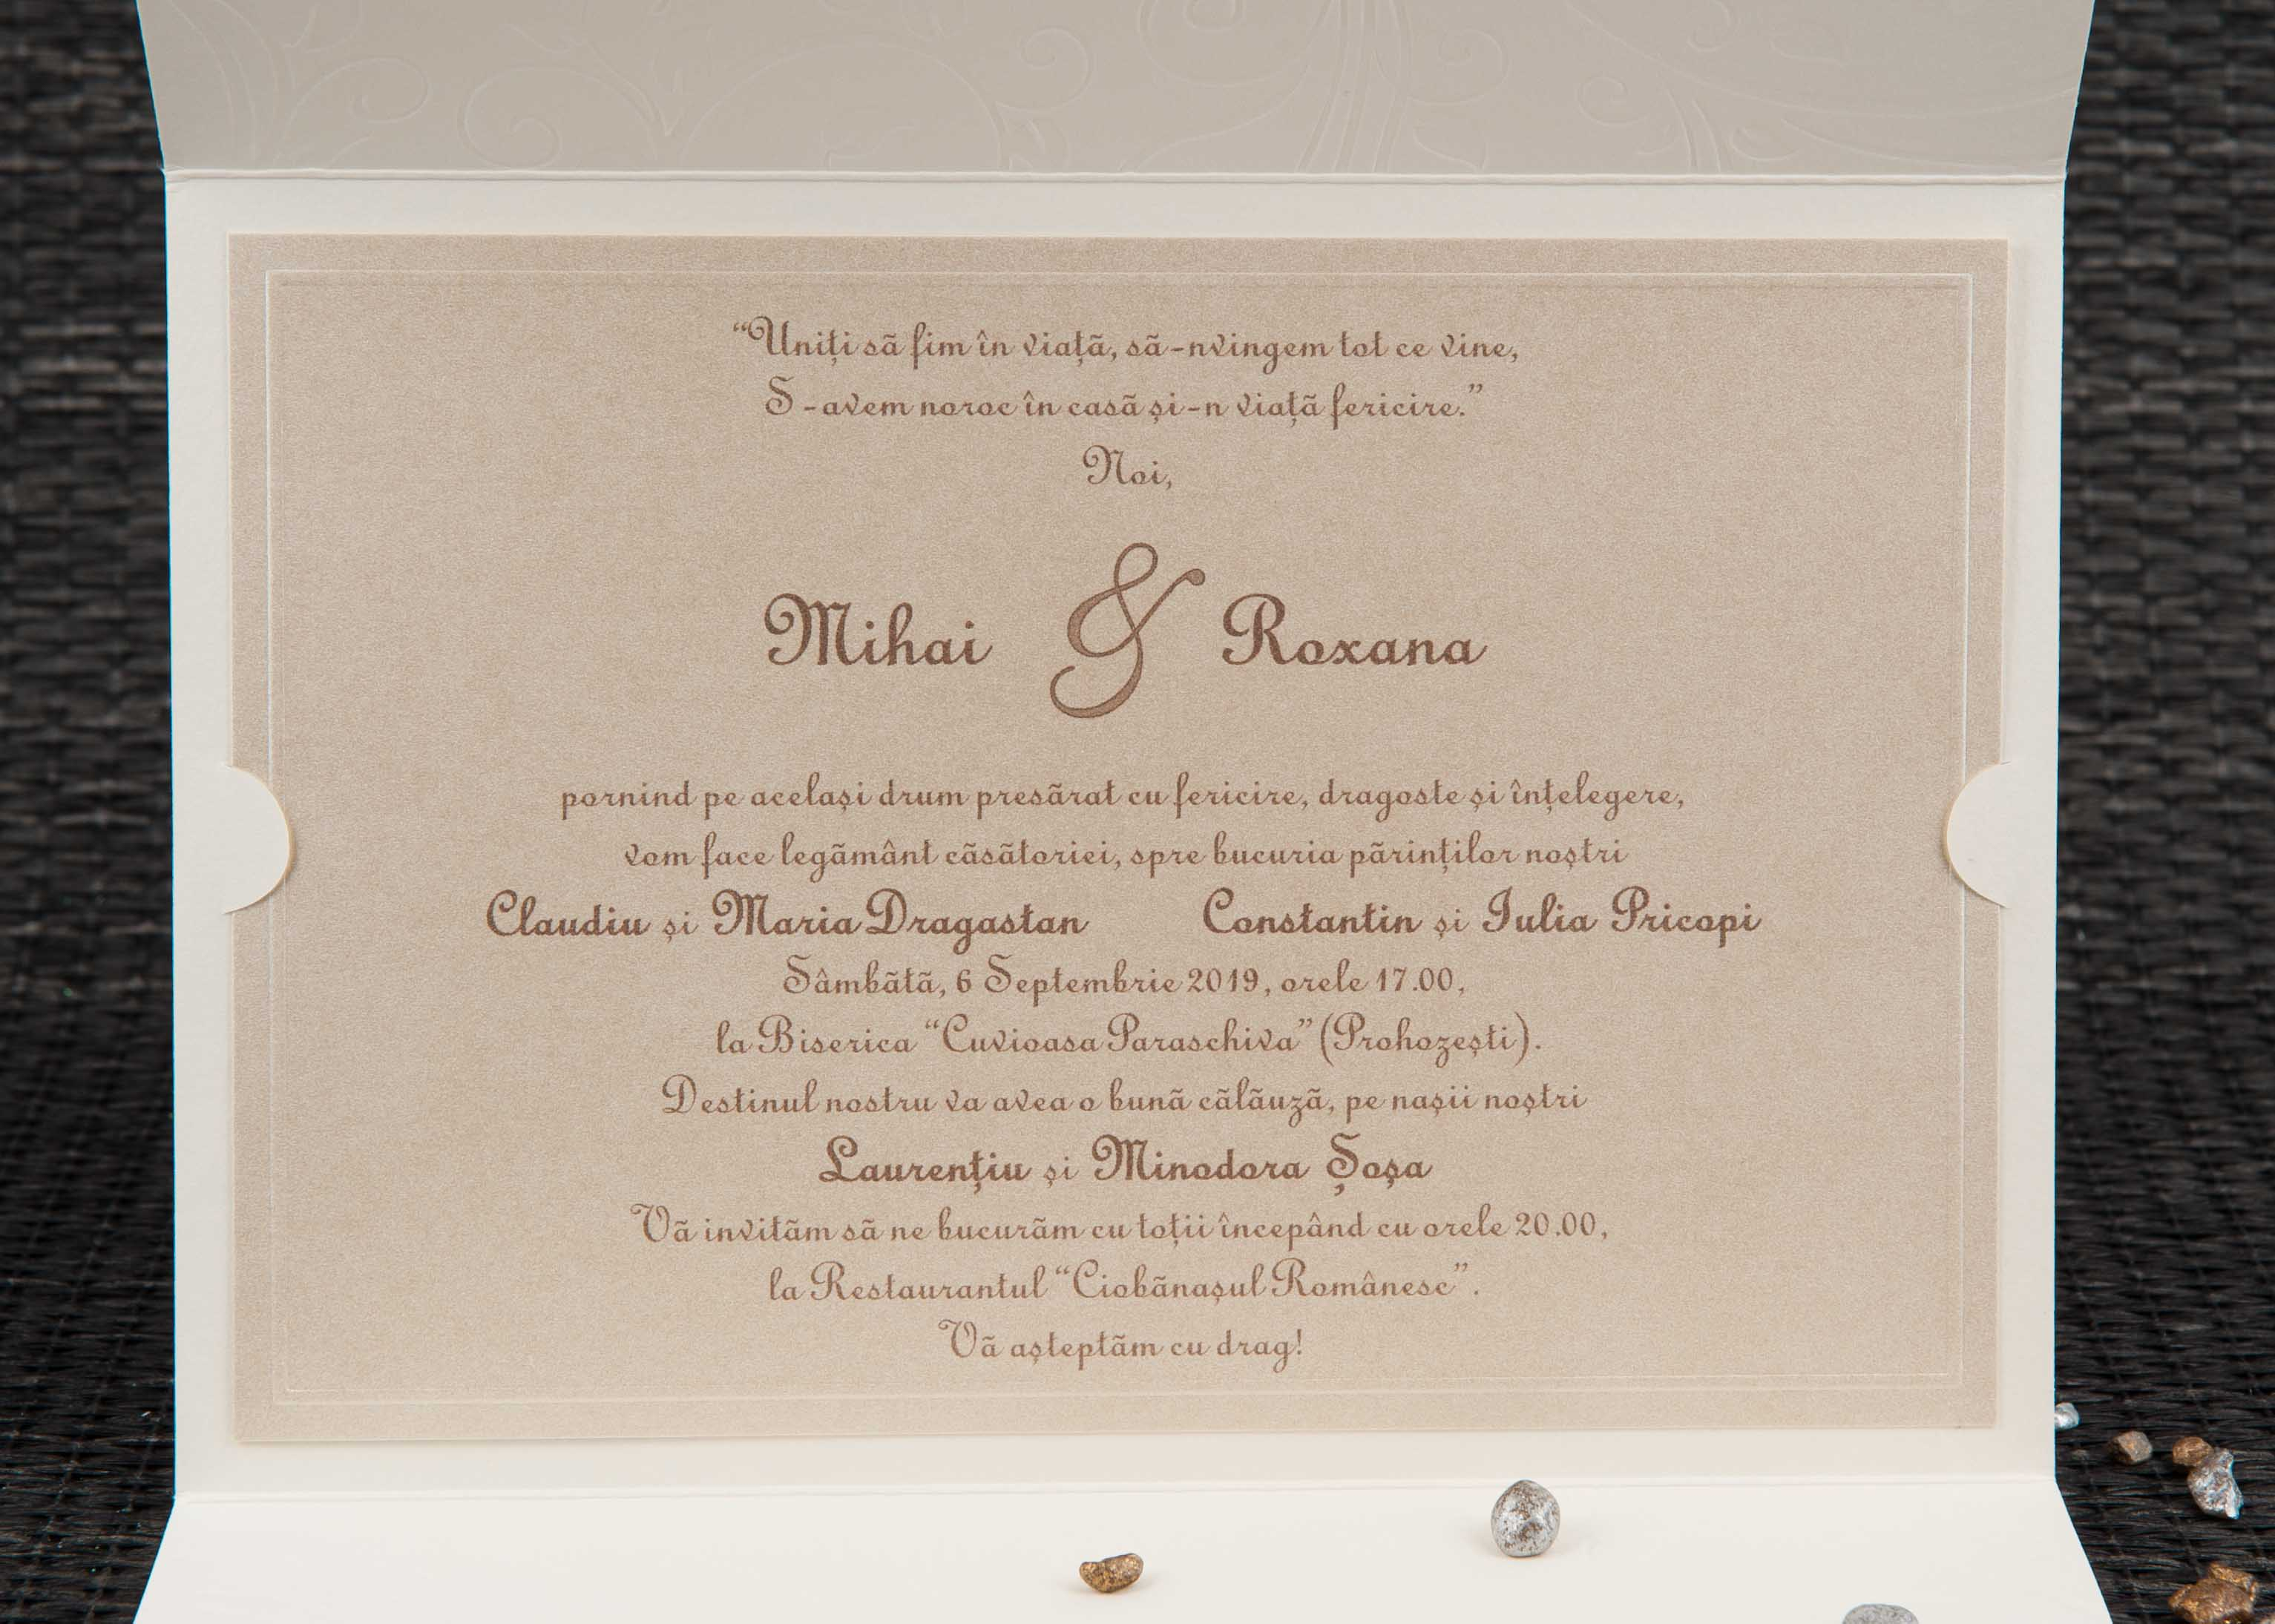 Invitatii Nunta 20804 Invitatii Garf